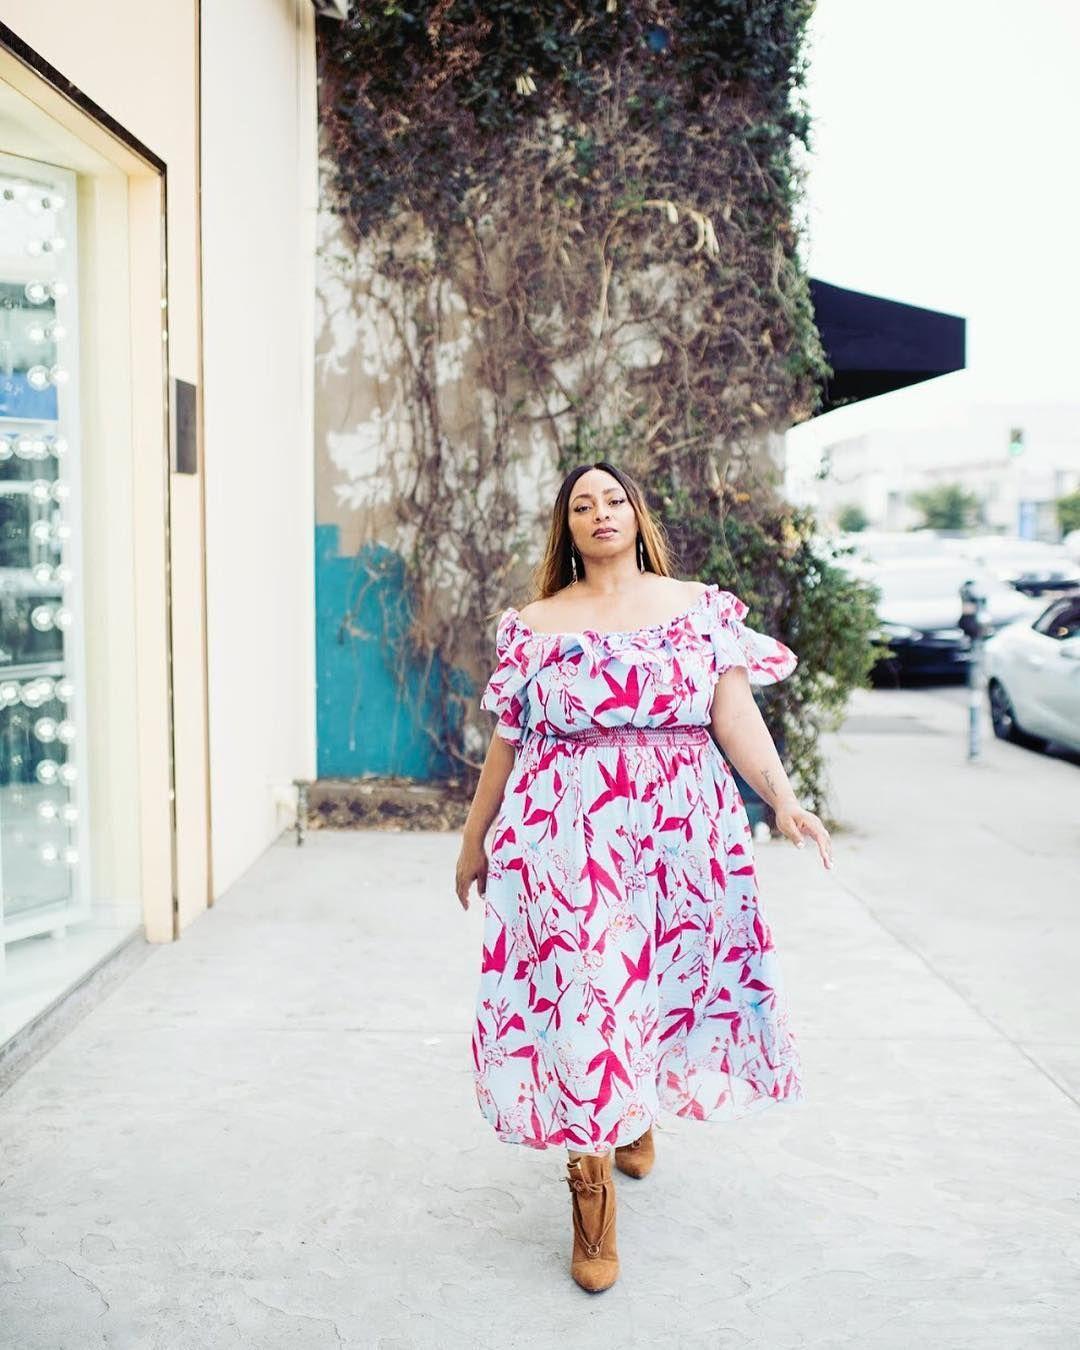 bdeb2fec7fef8 Tanya Taylor Parrot Tulip Meegan Dress—11 Honorè I Designer clothing in  sizes 10 to